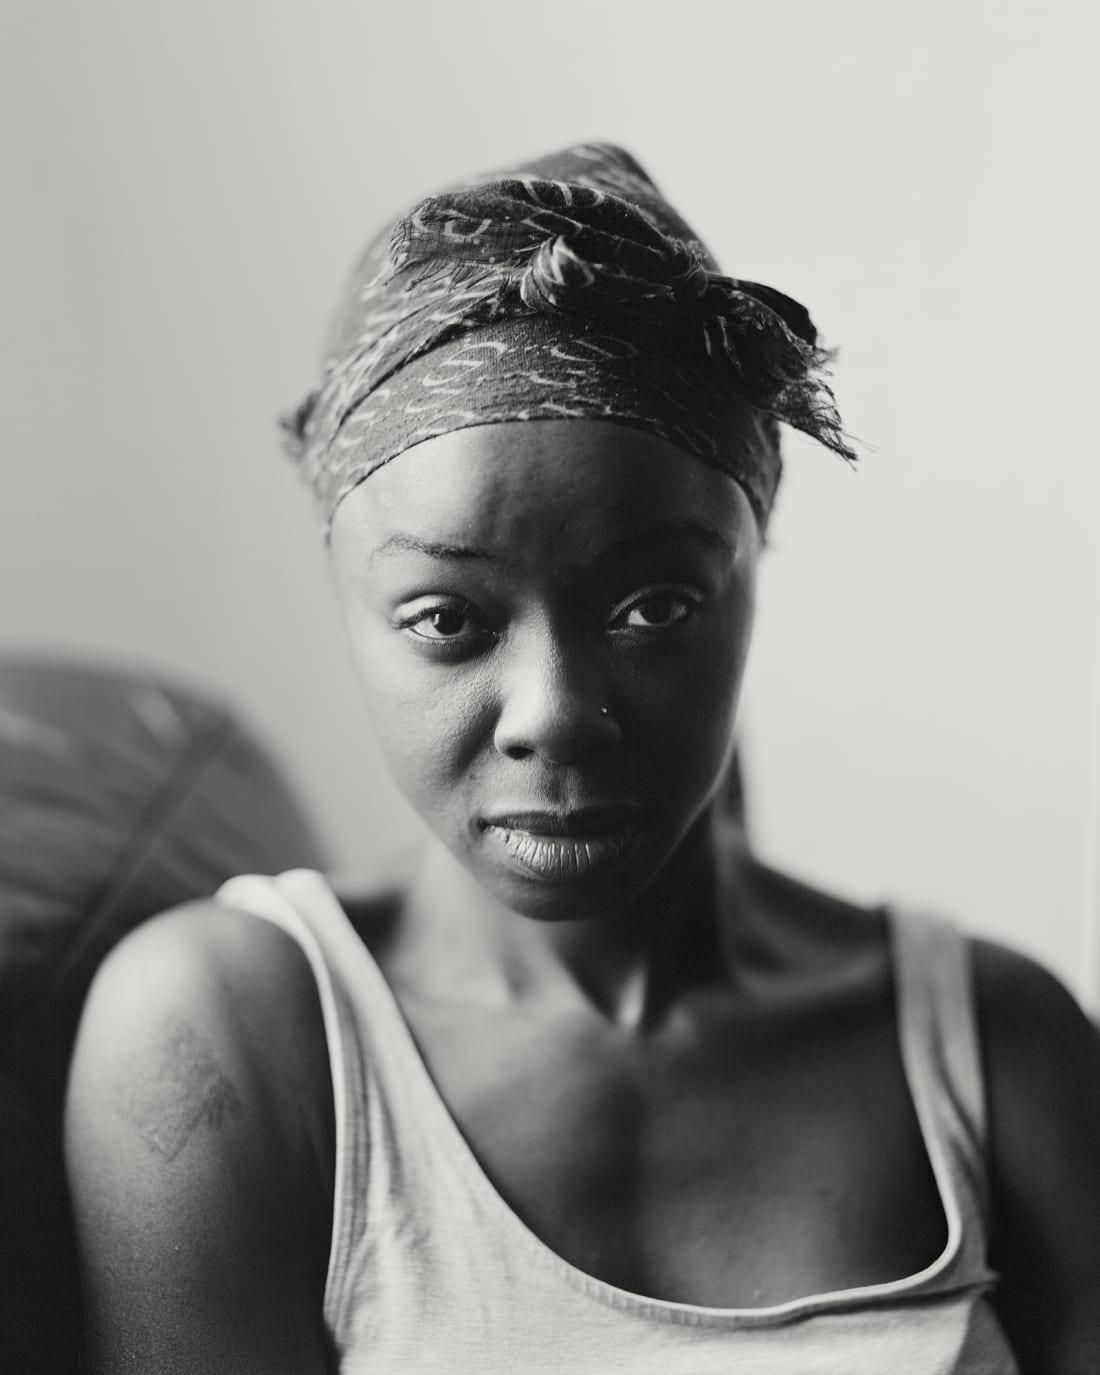 portrait photography sony photography award by craig easton